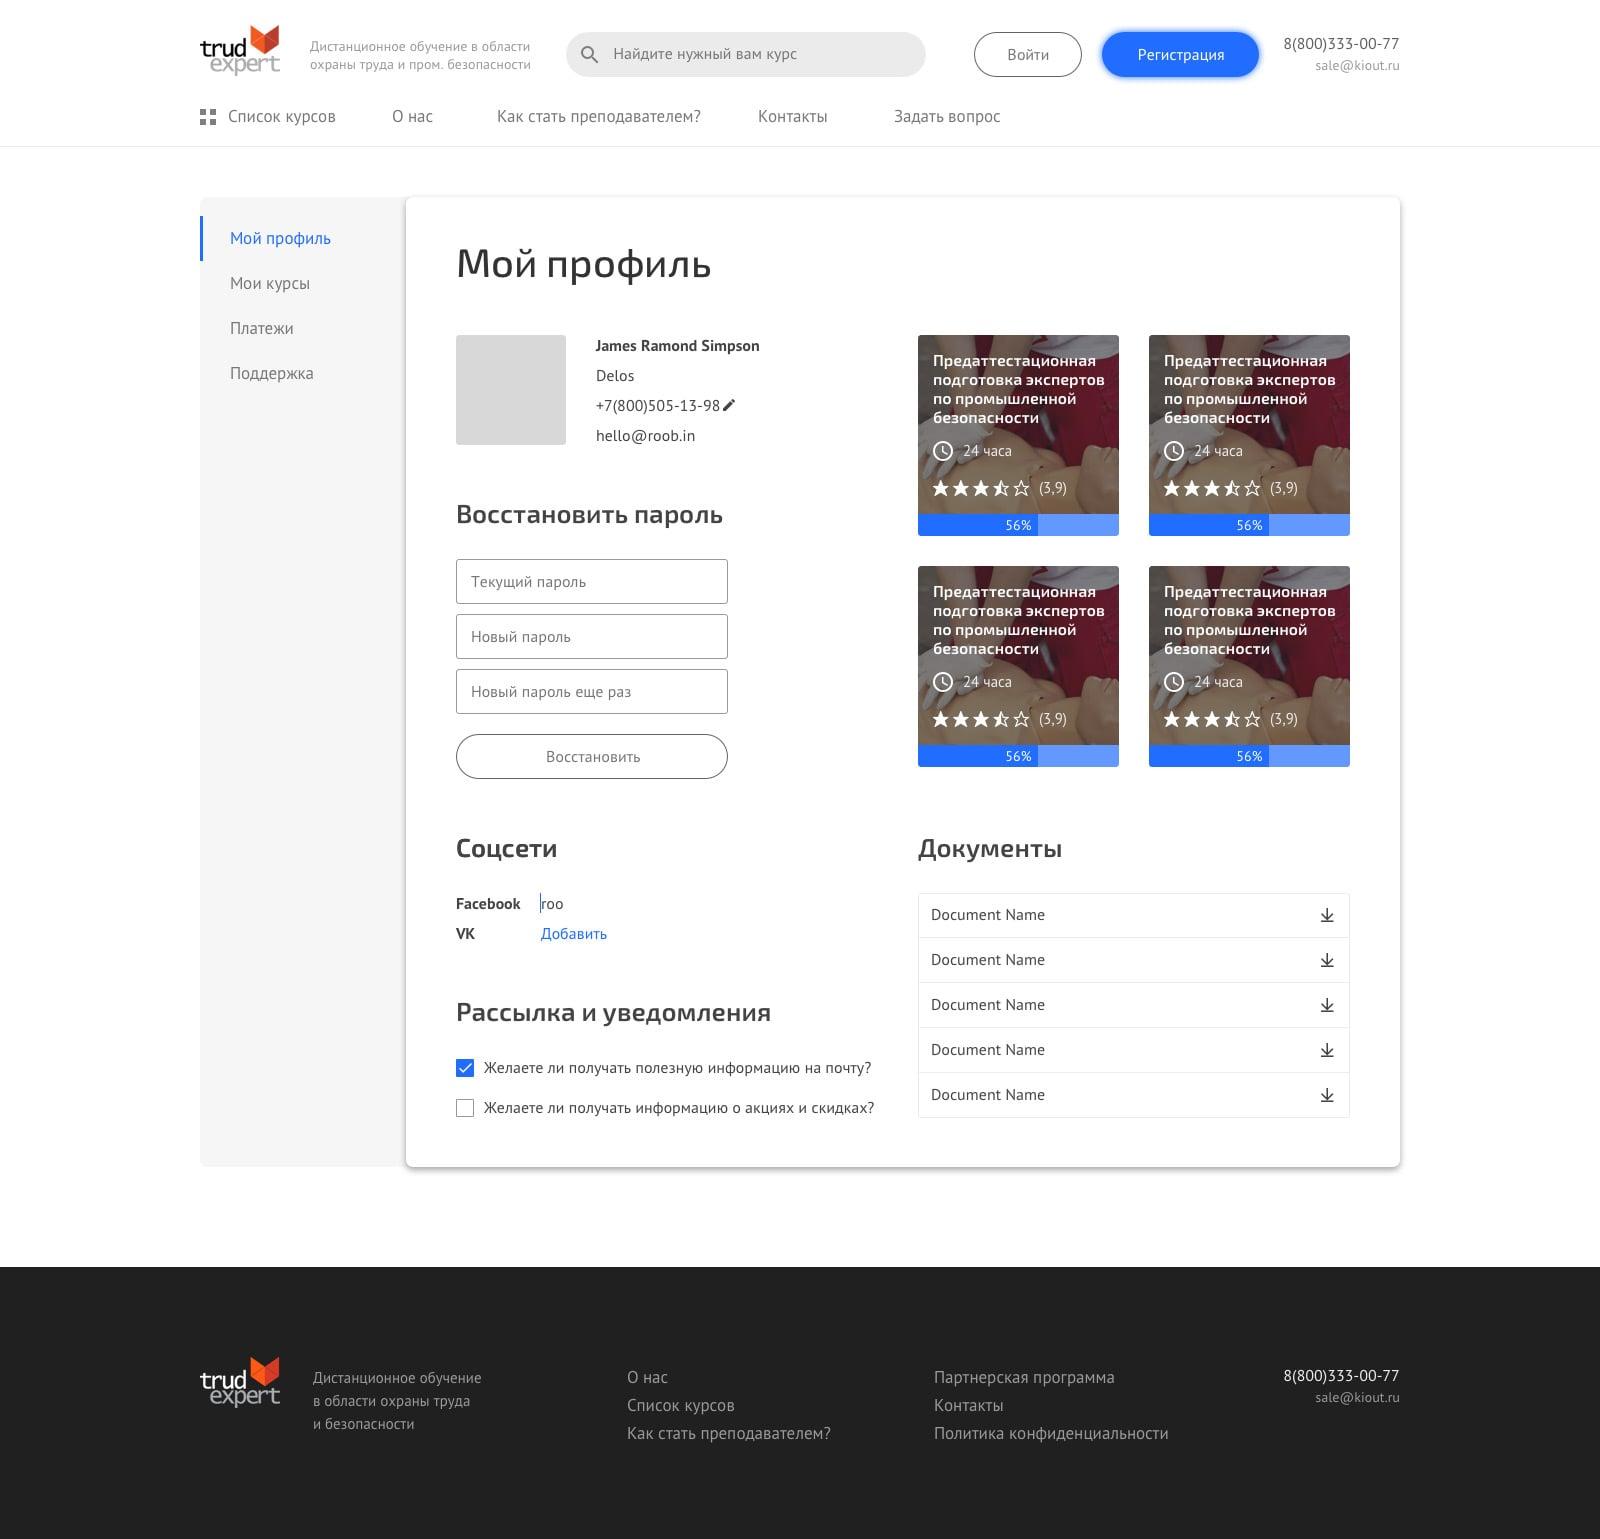 Платформа онлайн образования TrudExpert